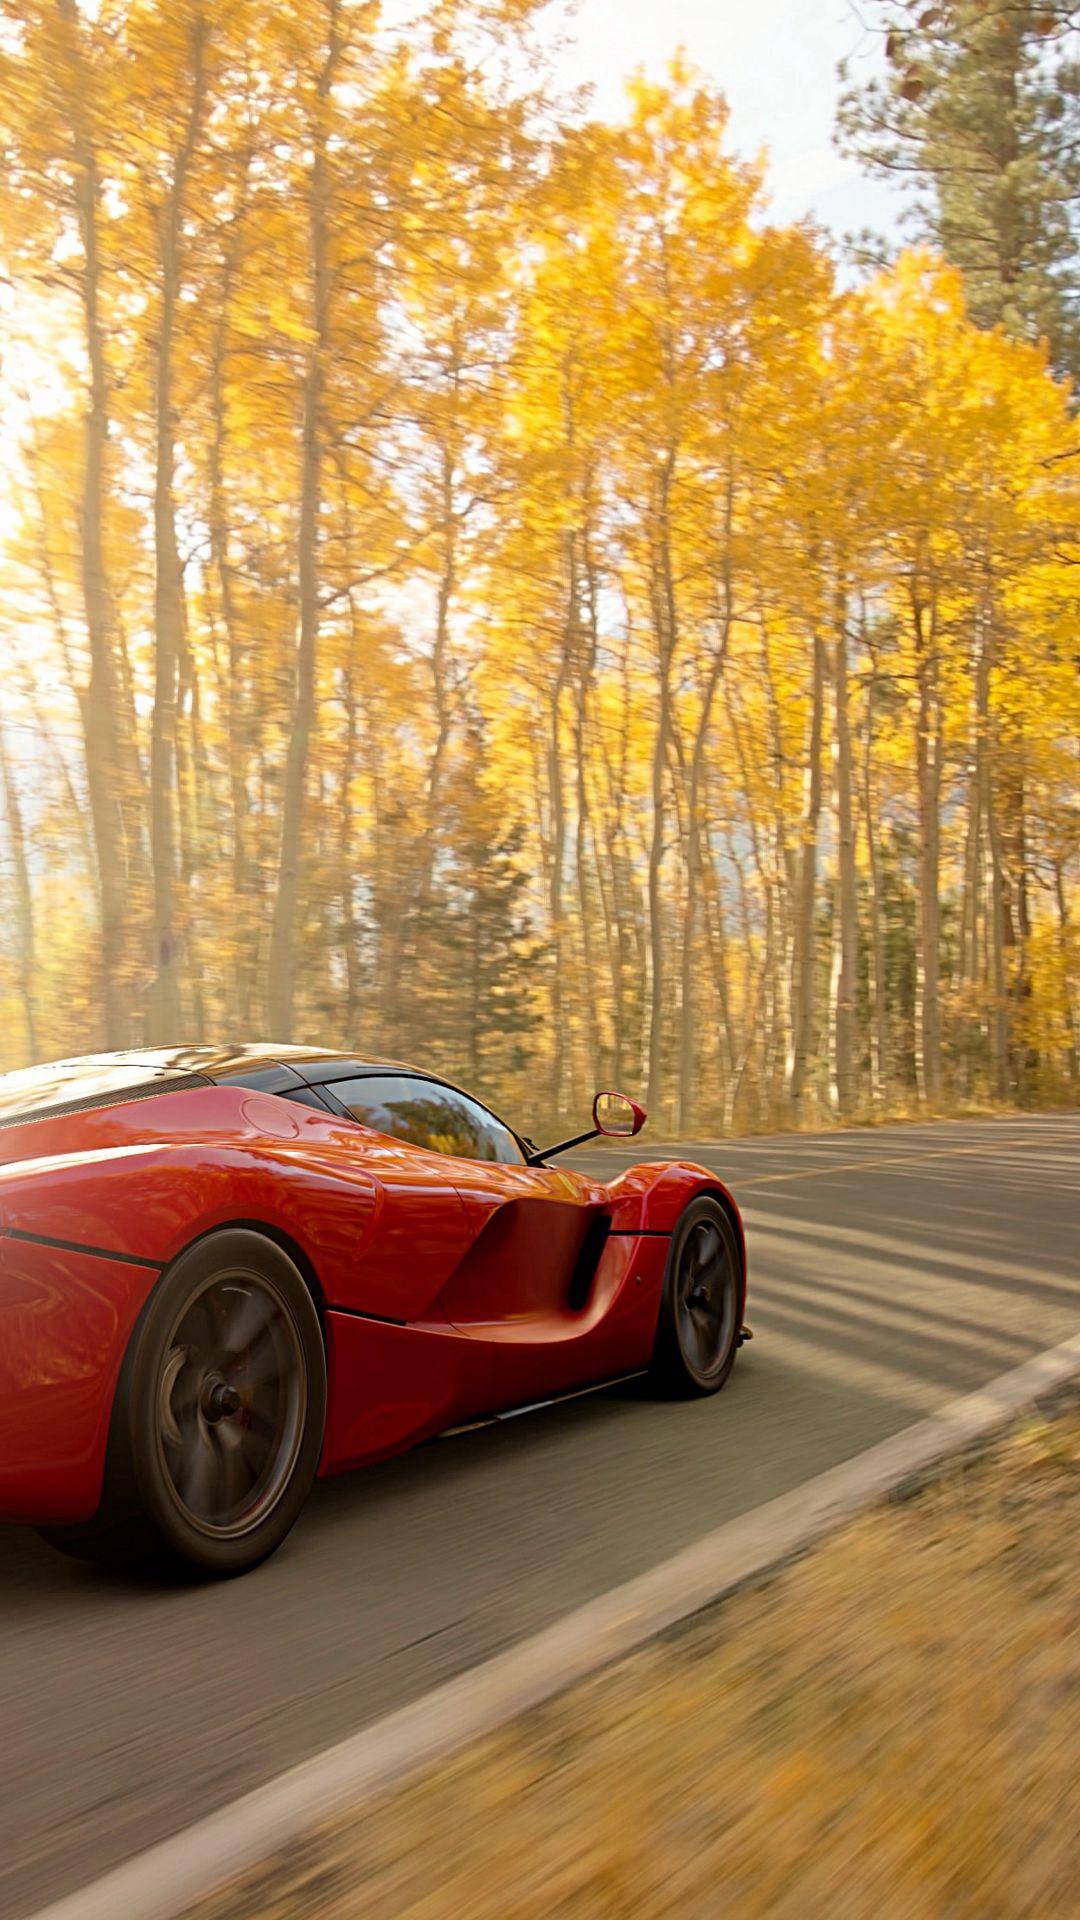 Ferrari Sportscar Wallpapers Free Download